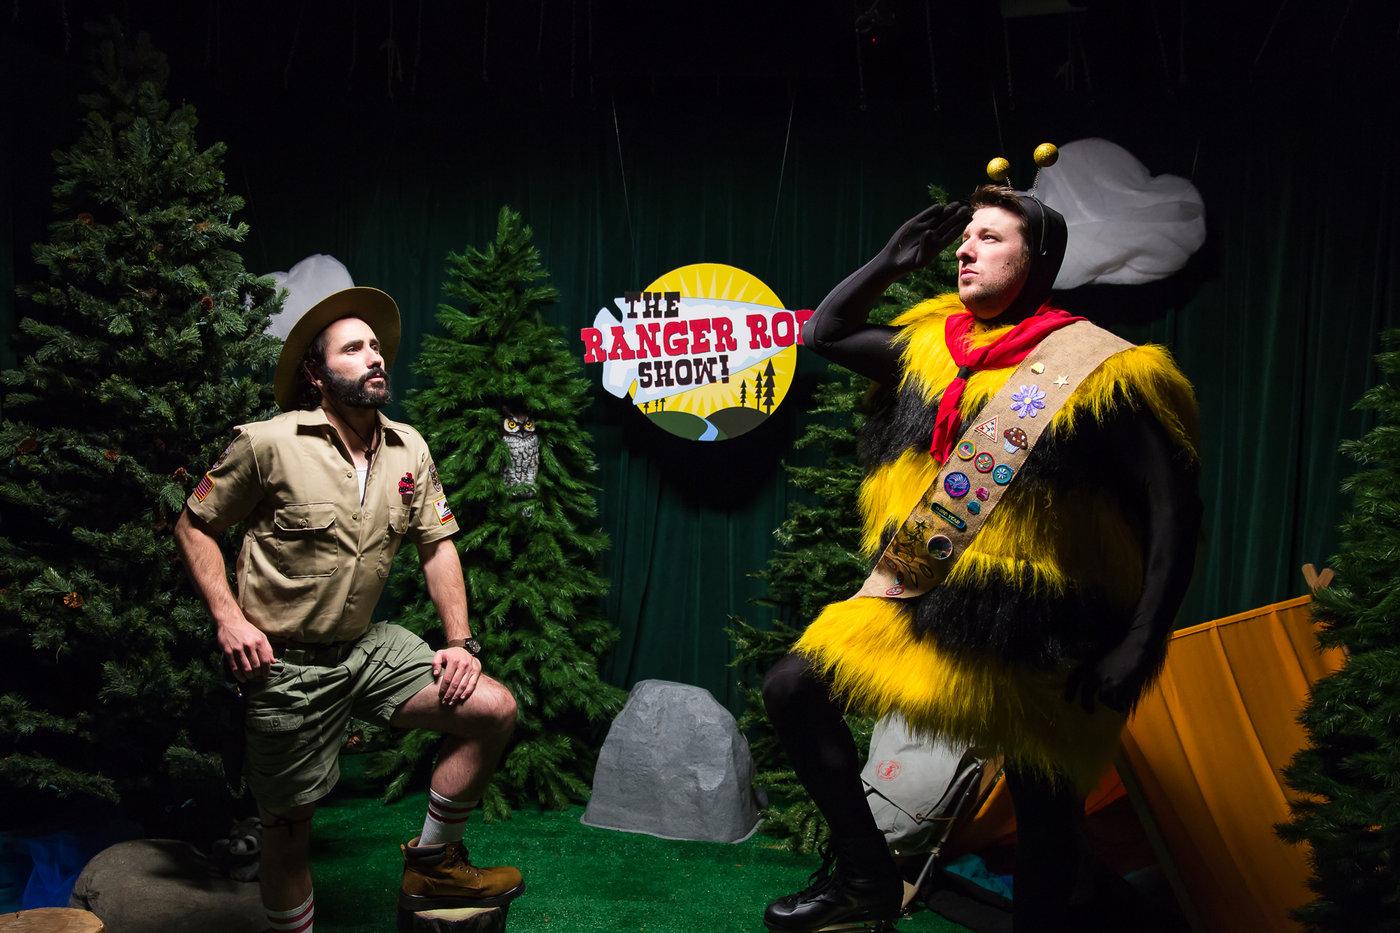 The+Ranger+Rob+Show-052.jpg